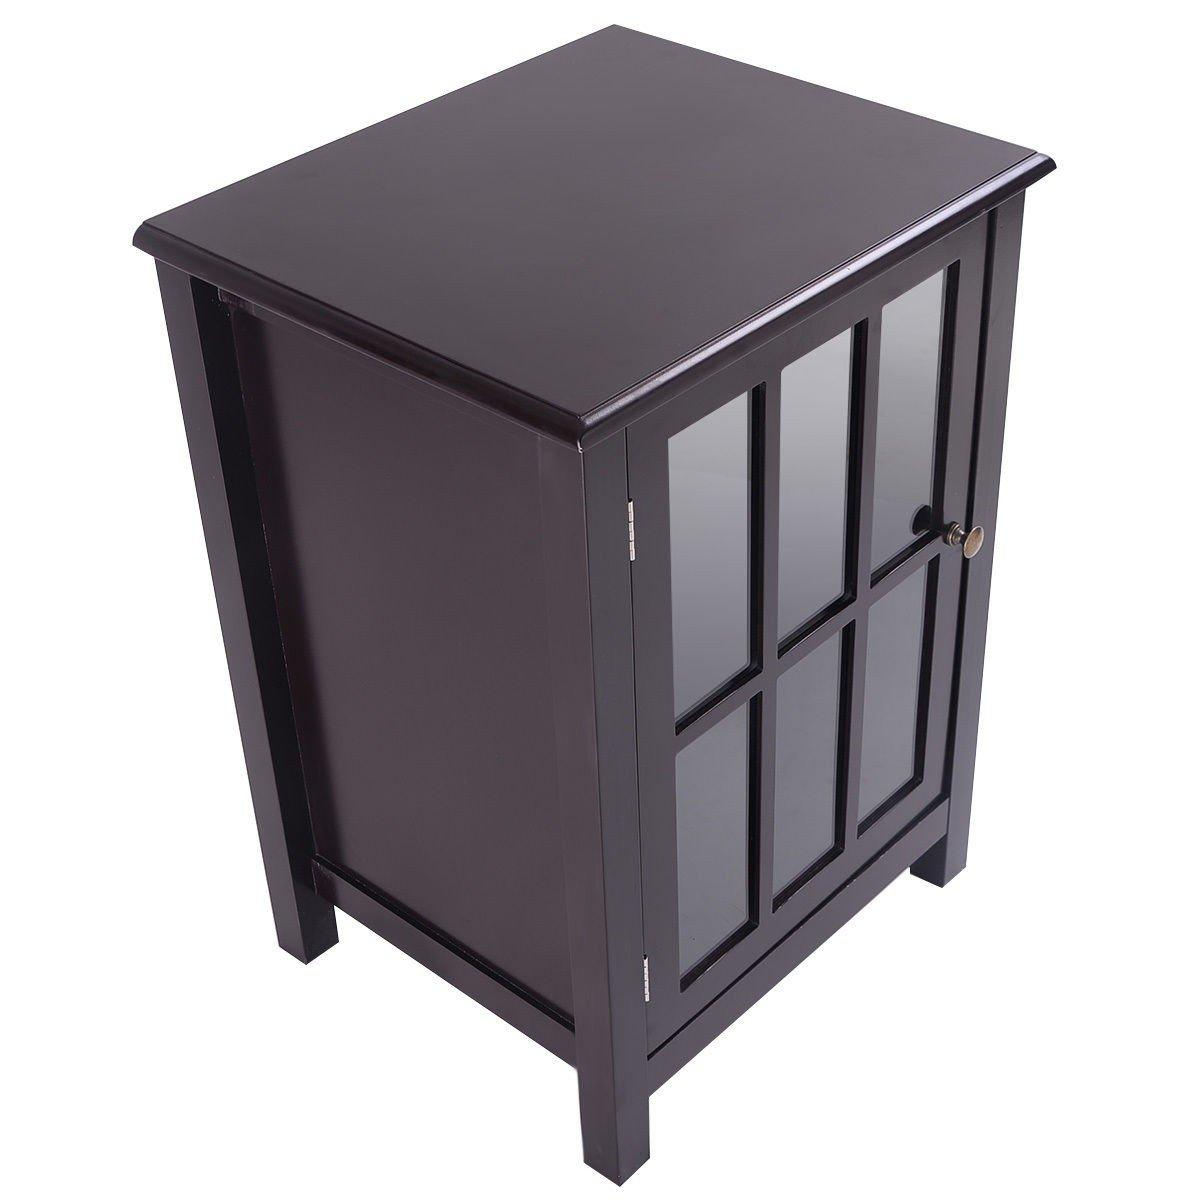 MyEasyShopping Door Storage Single Cabinet Pantry Organizer Kitchen Cupboard Furniture Shelves Home Wood Office Shelf Bathroom Display Adjustable Locker